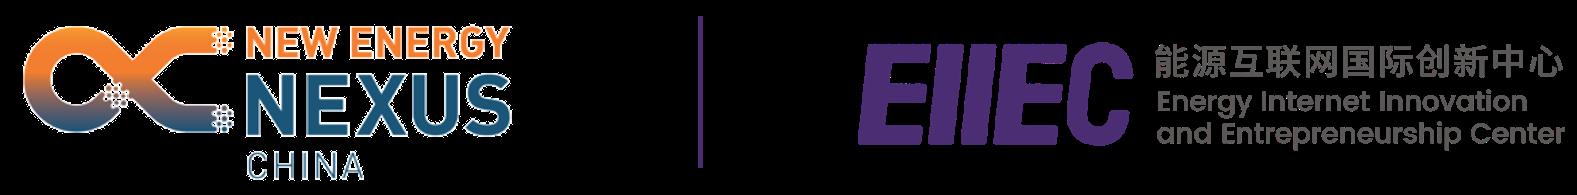 Nex Chn Eiiec Logo